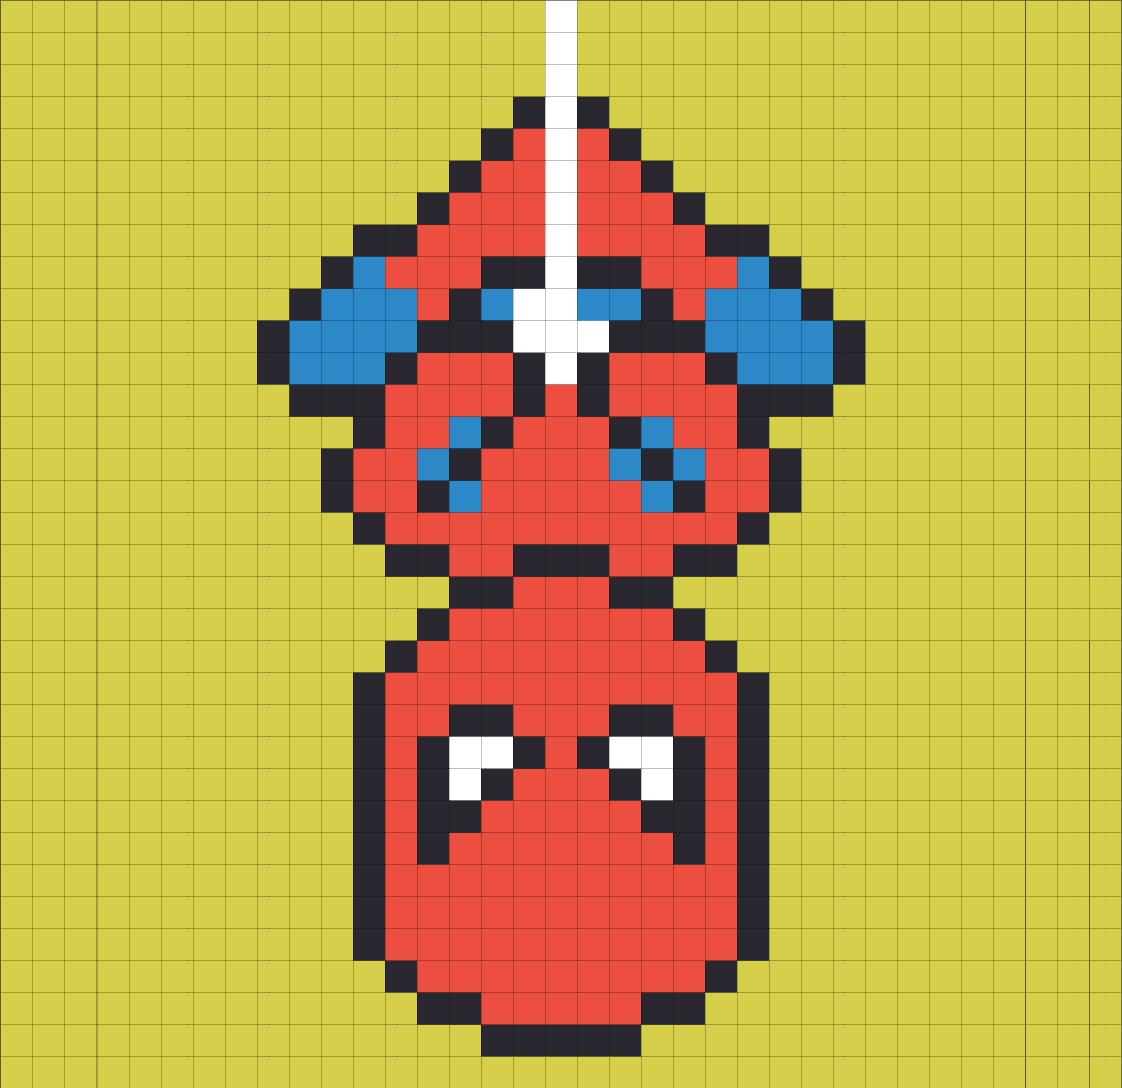 Afficher L Image D Origine Pixel Art Super Heros